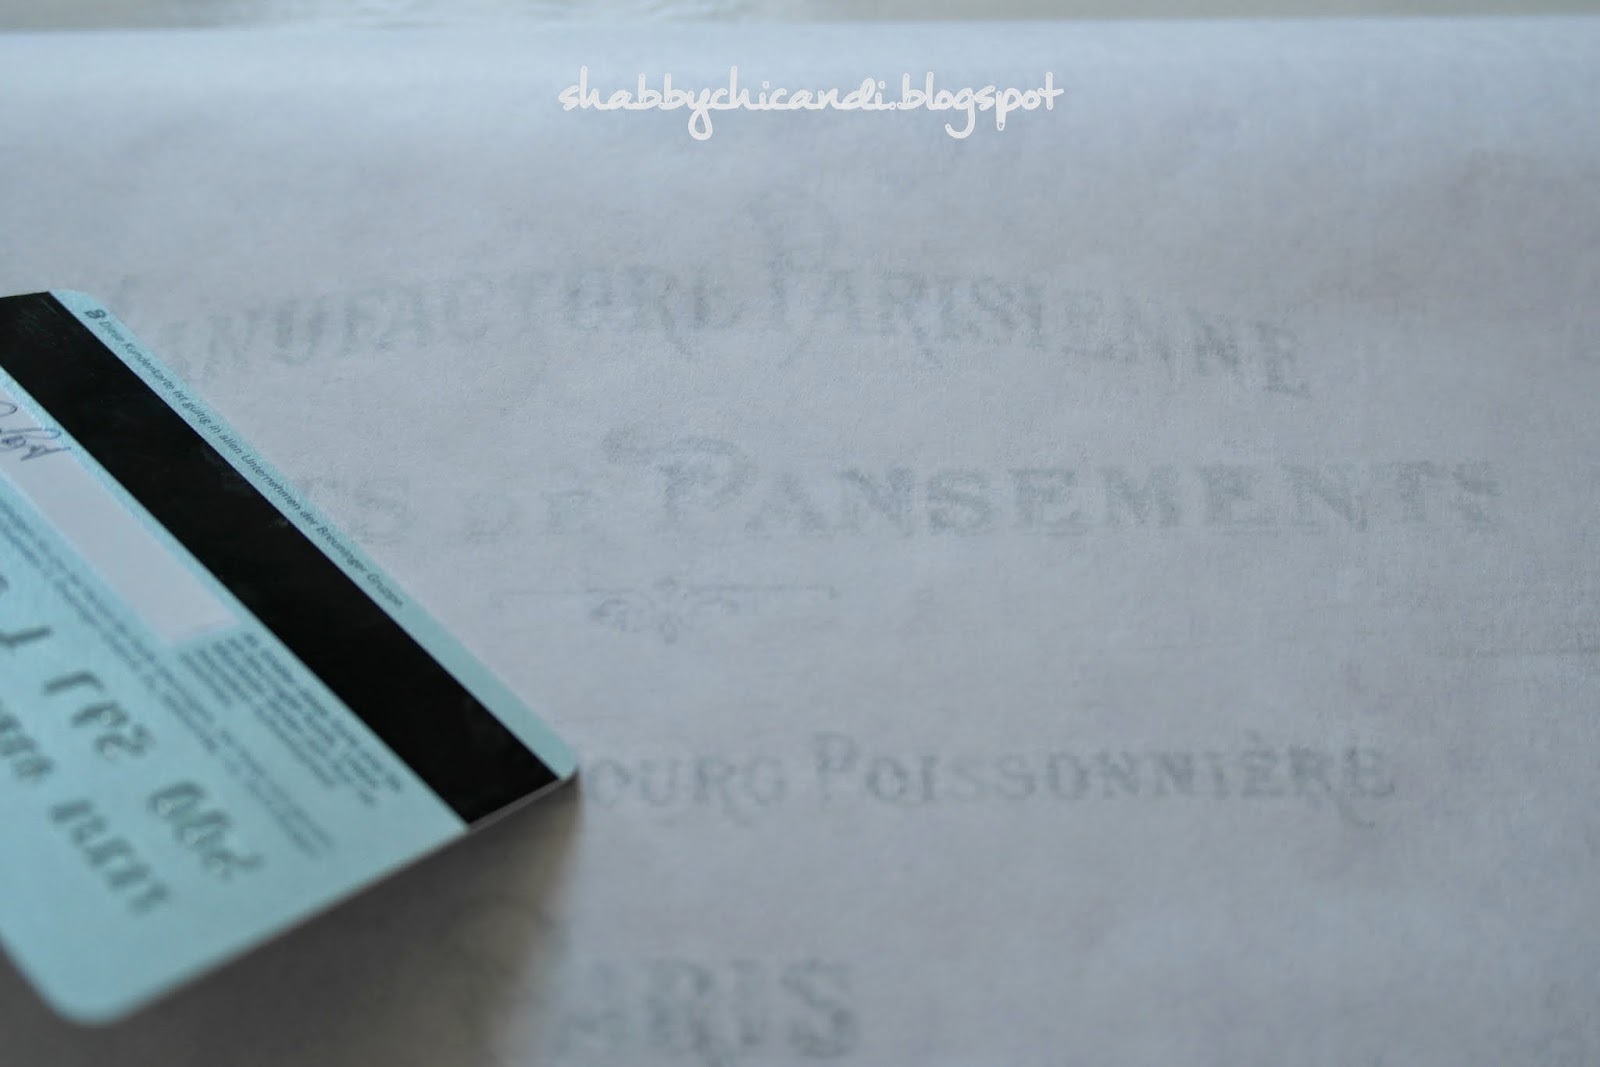 shabby chic and i shabby chic diy und deko diy tuturial freezer papier nr 3 motive auf holz. Black Bedroom Furniture Sets. Home Design Ideas